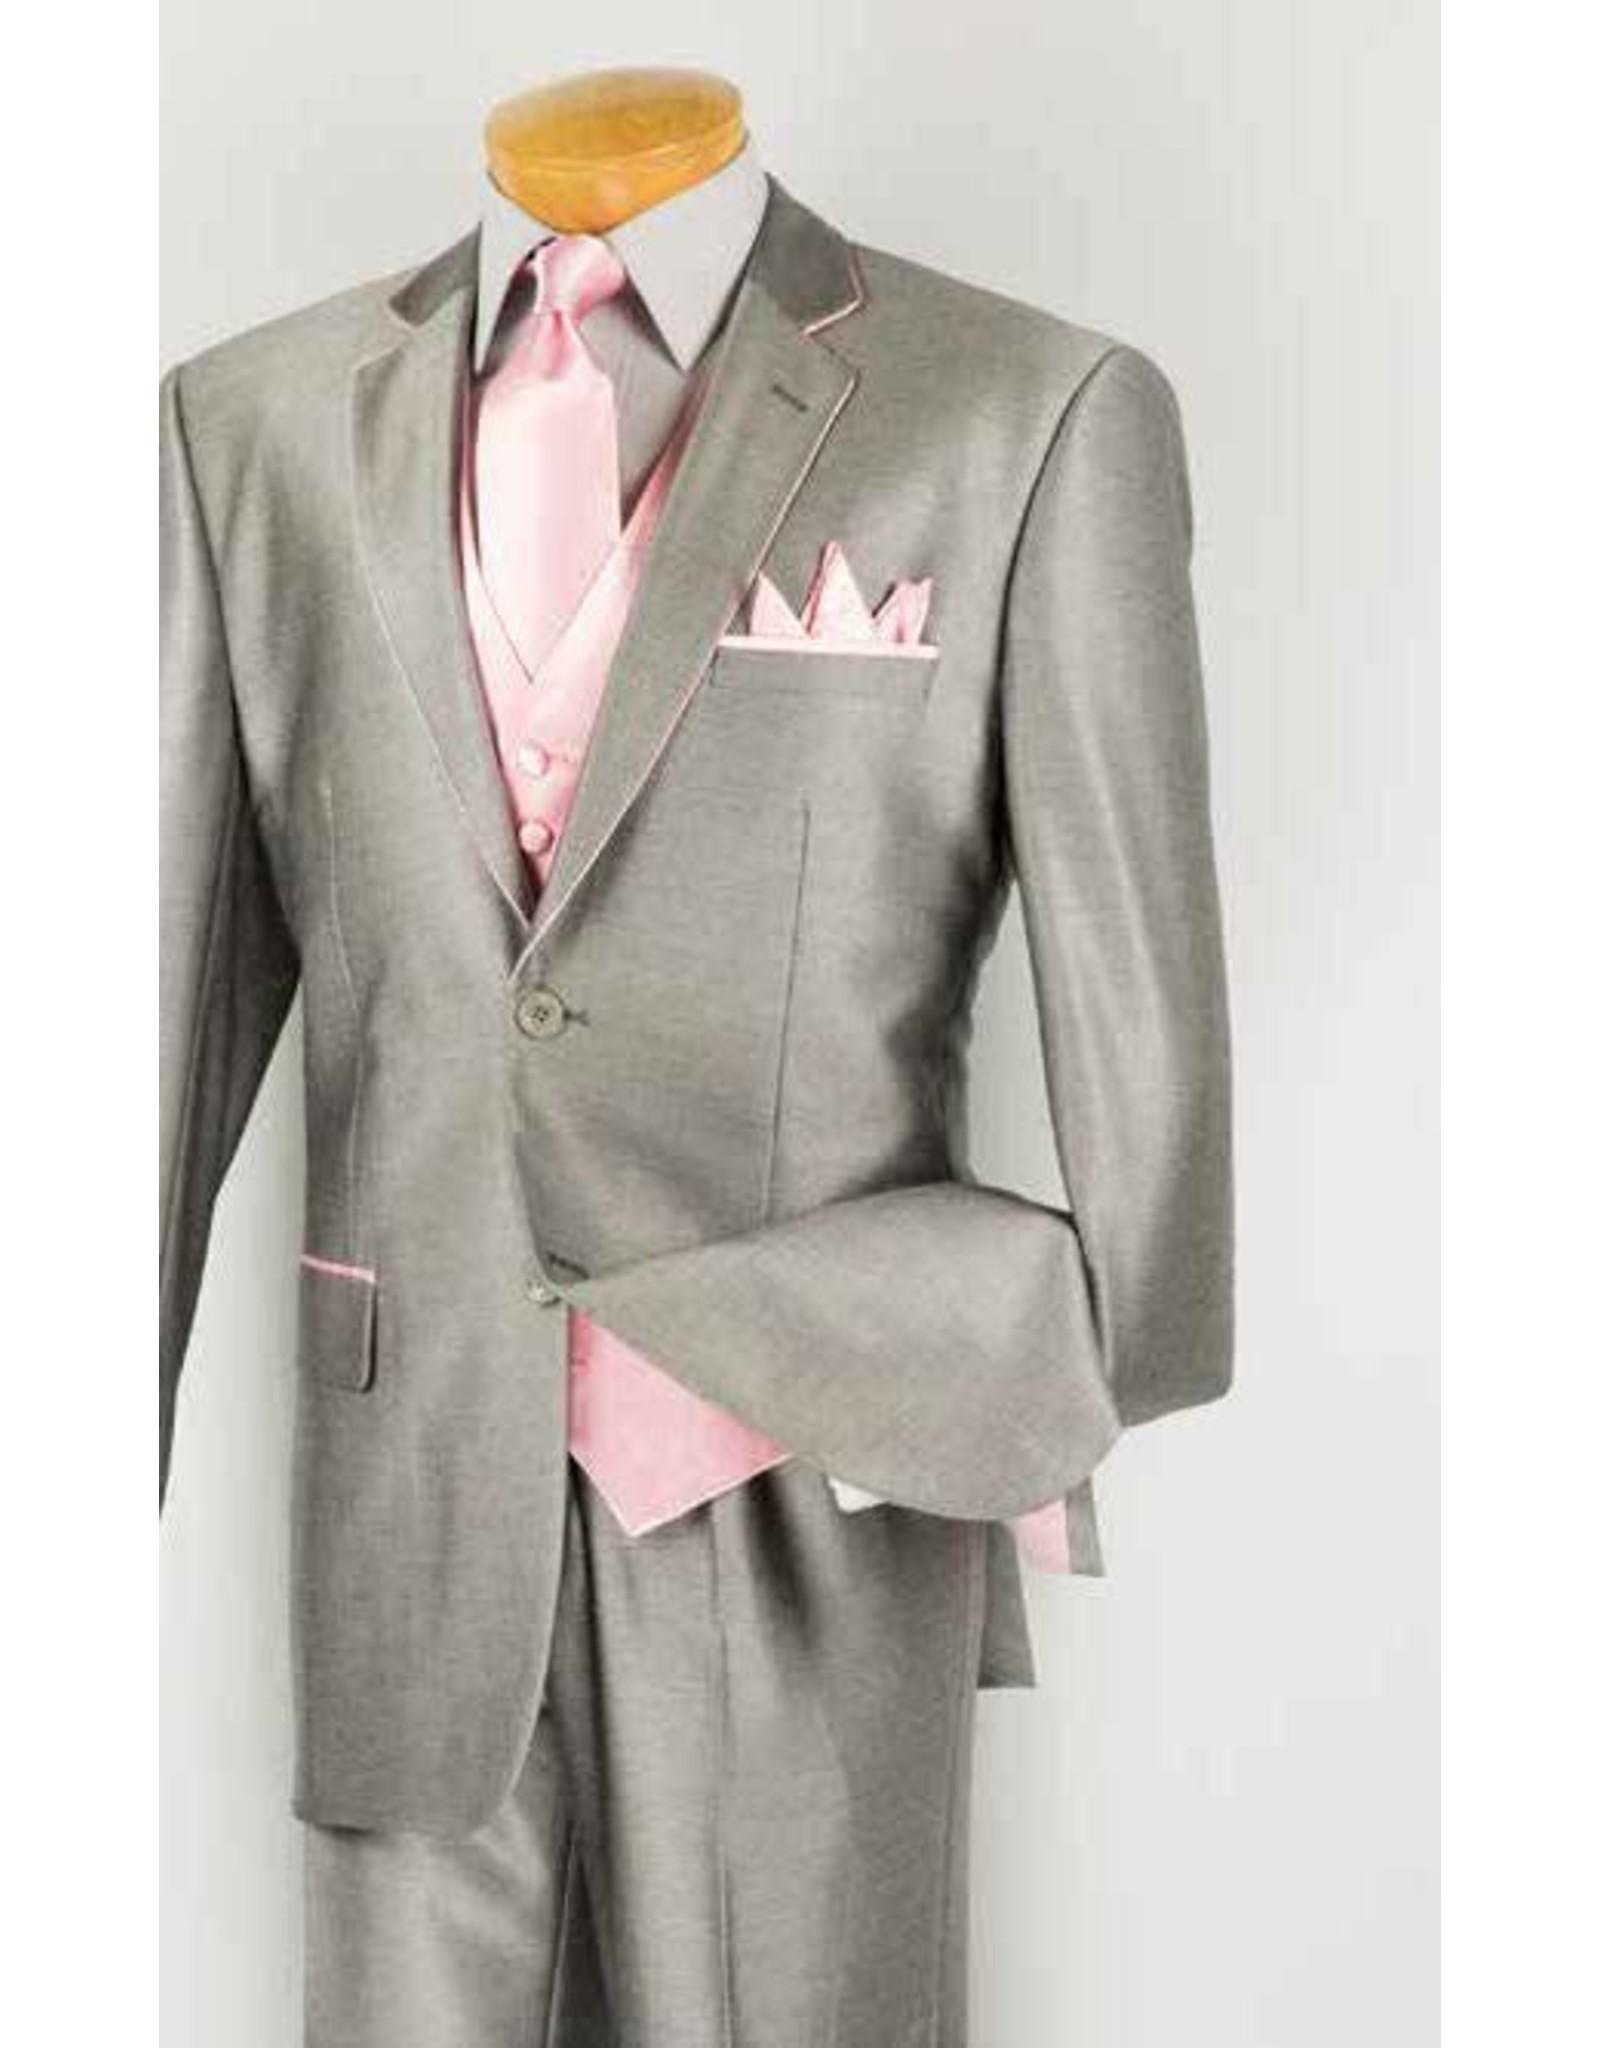 Vinci Vinci Vested Suit - 23SS4 Gray/Pink